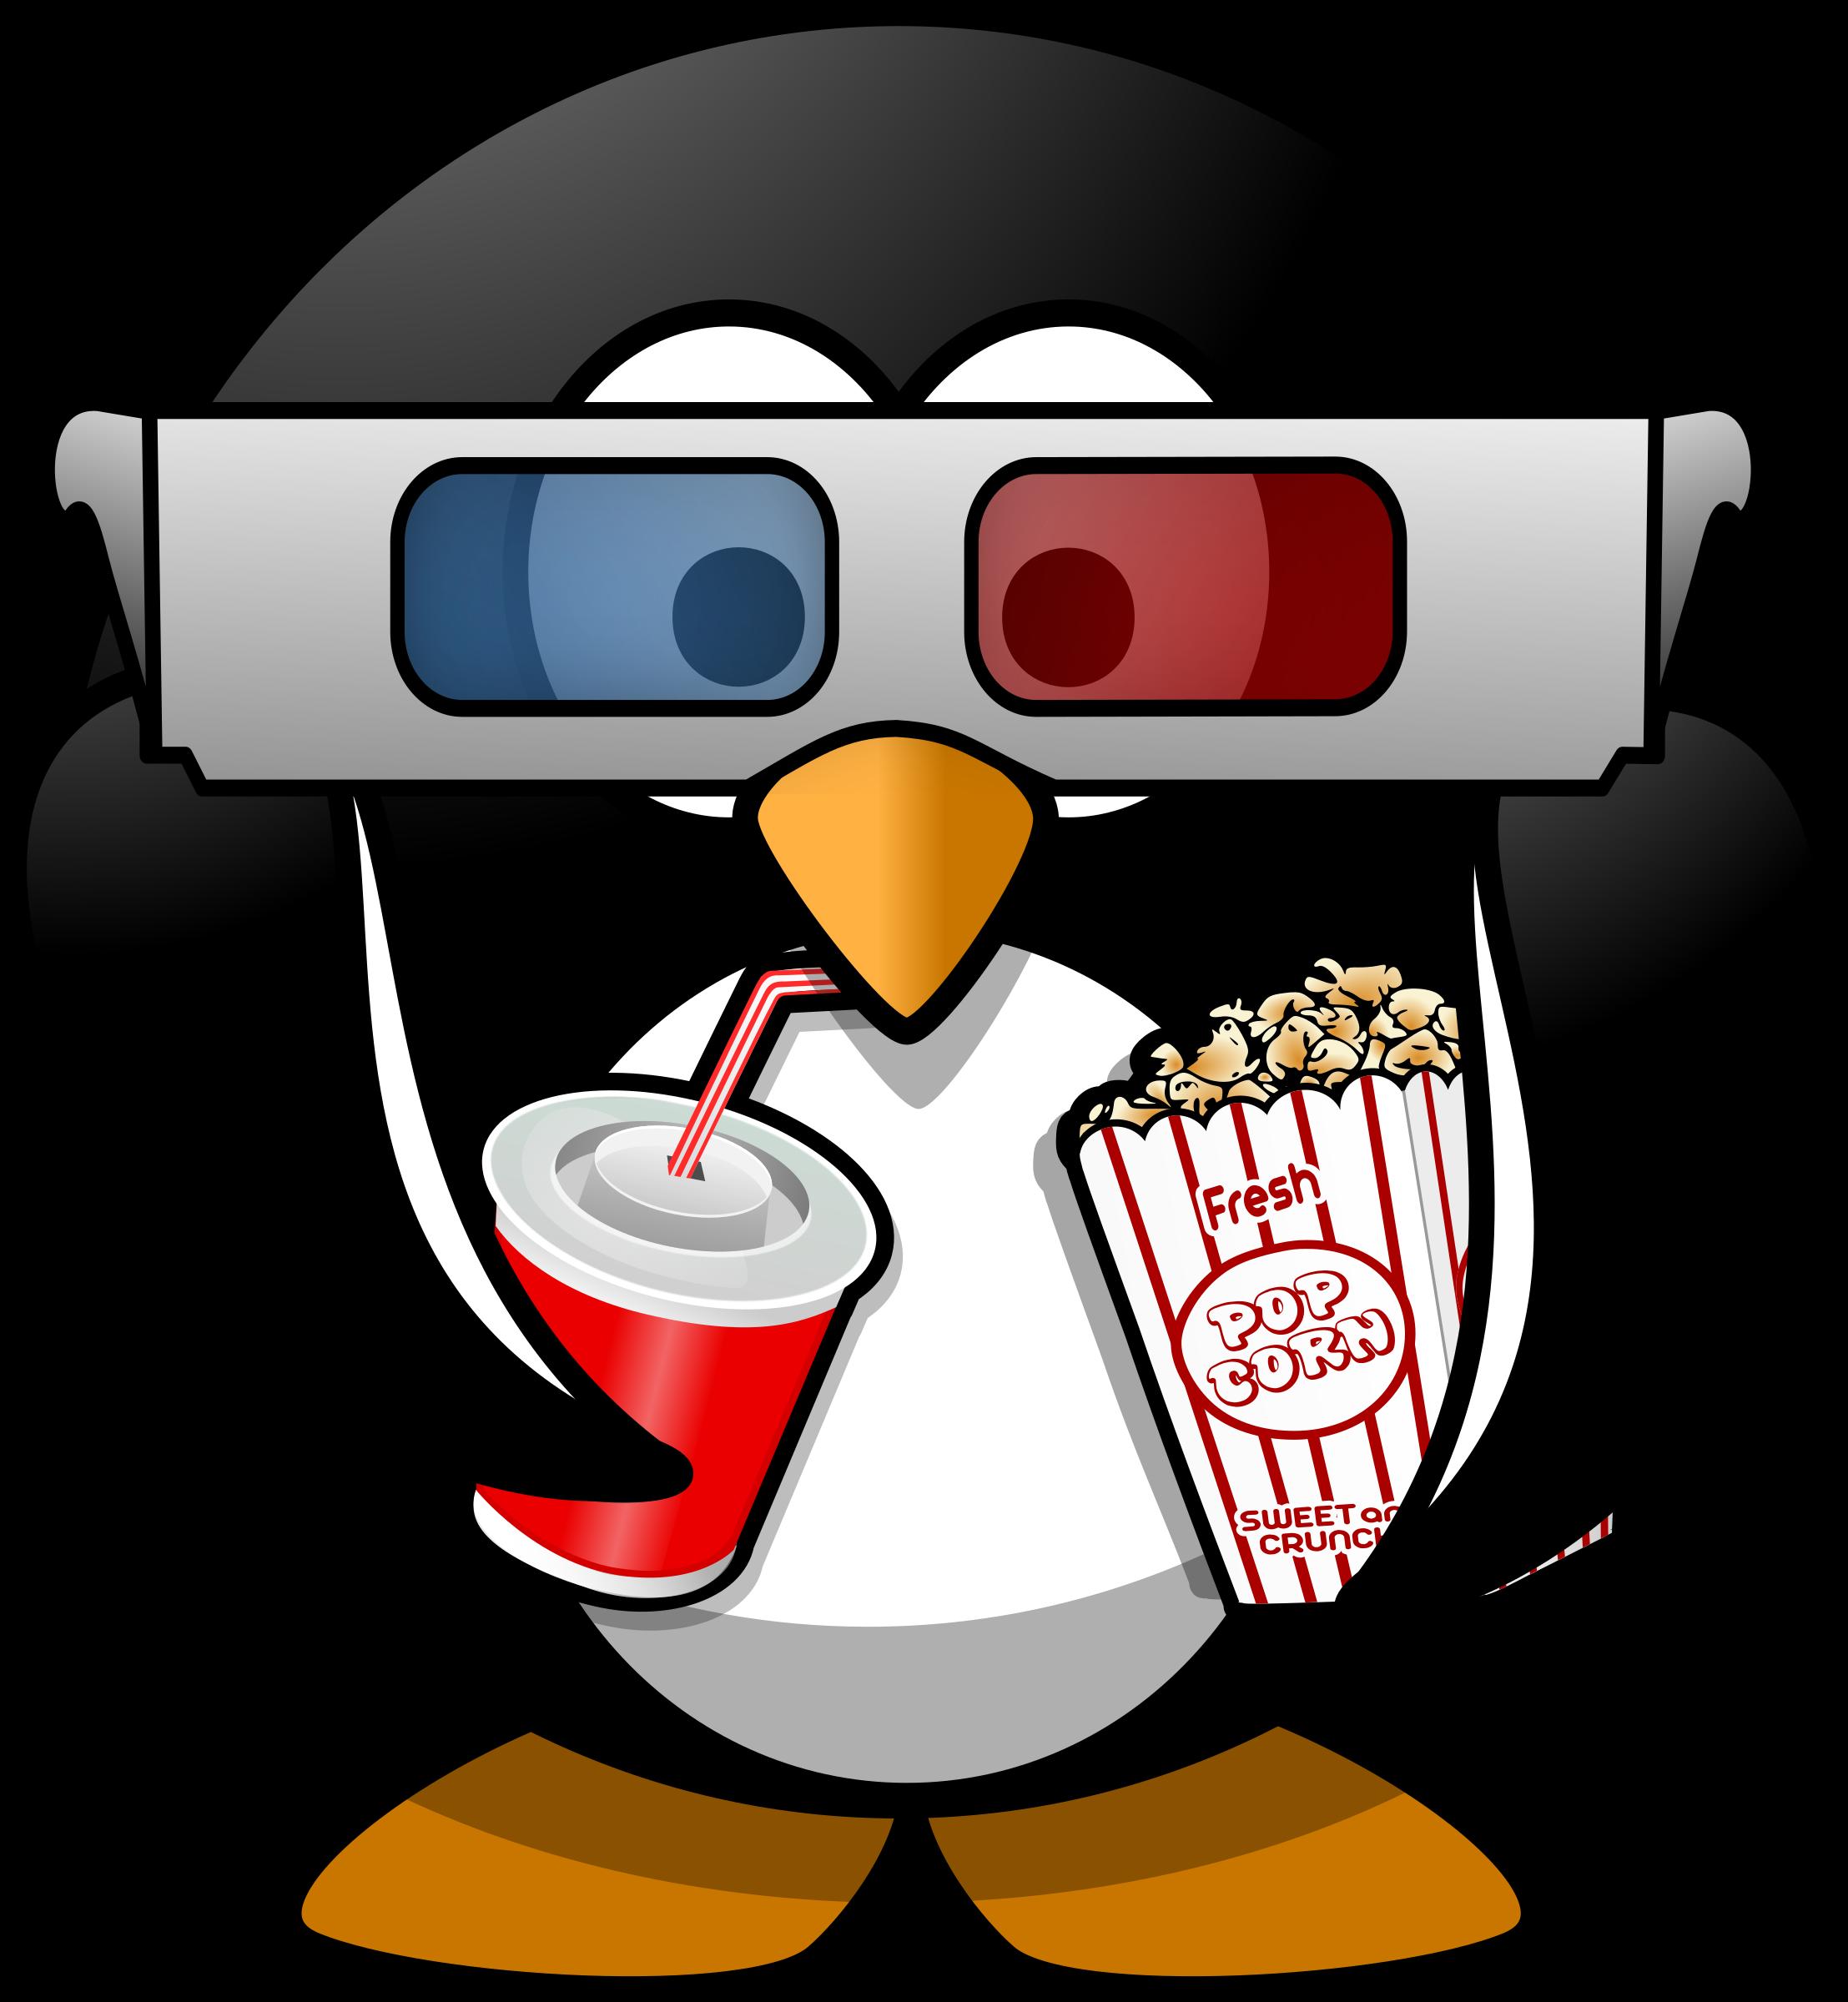 Drunk penguin clipart freeuse download Download Penguin Clipart Drunk - Cinema Clipart PNG Image with No ... freeuse download